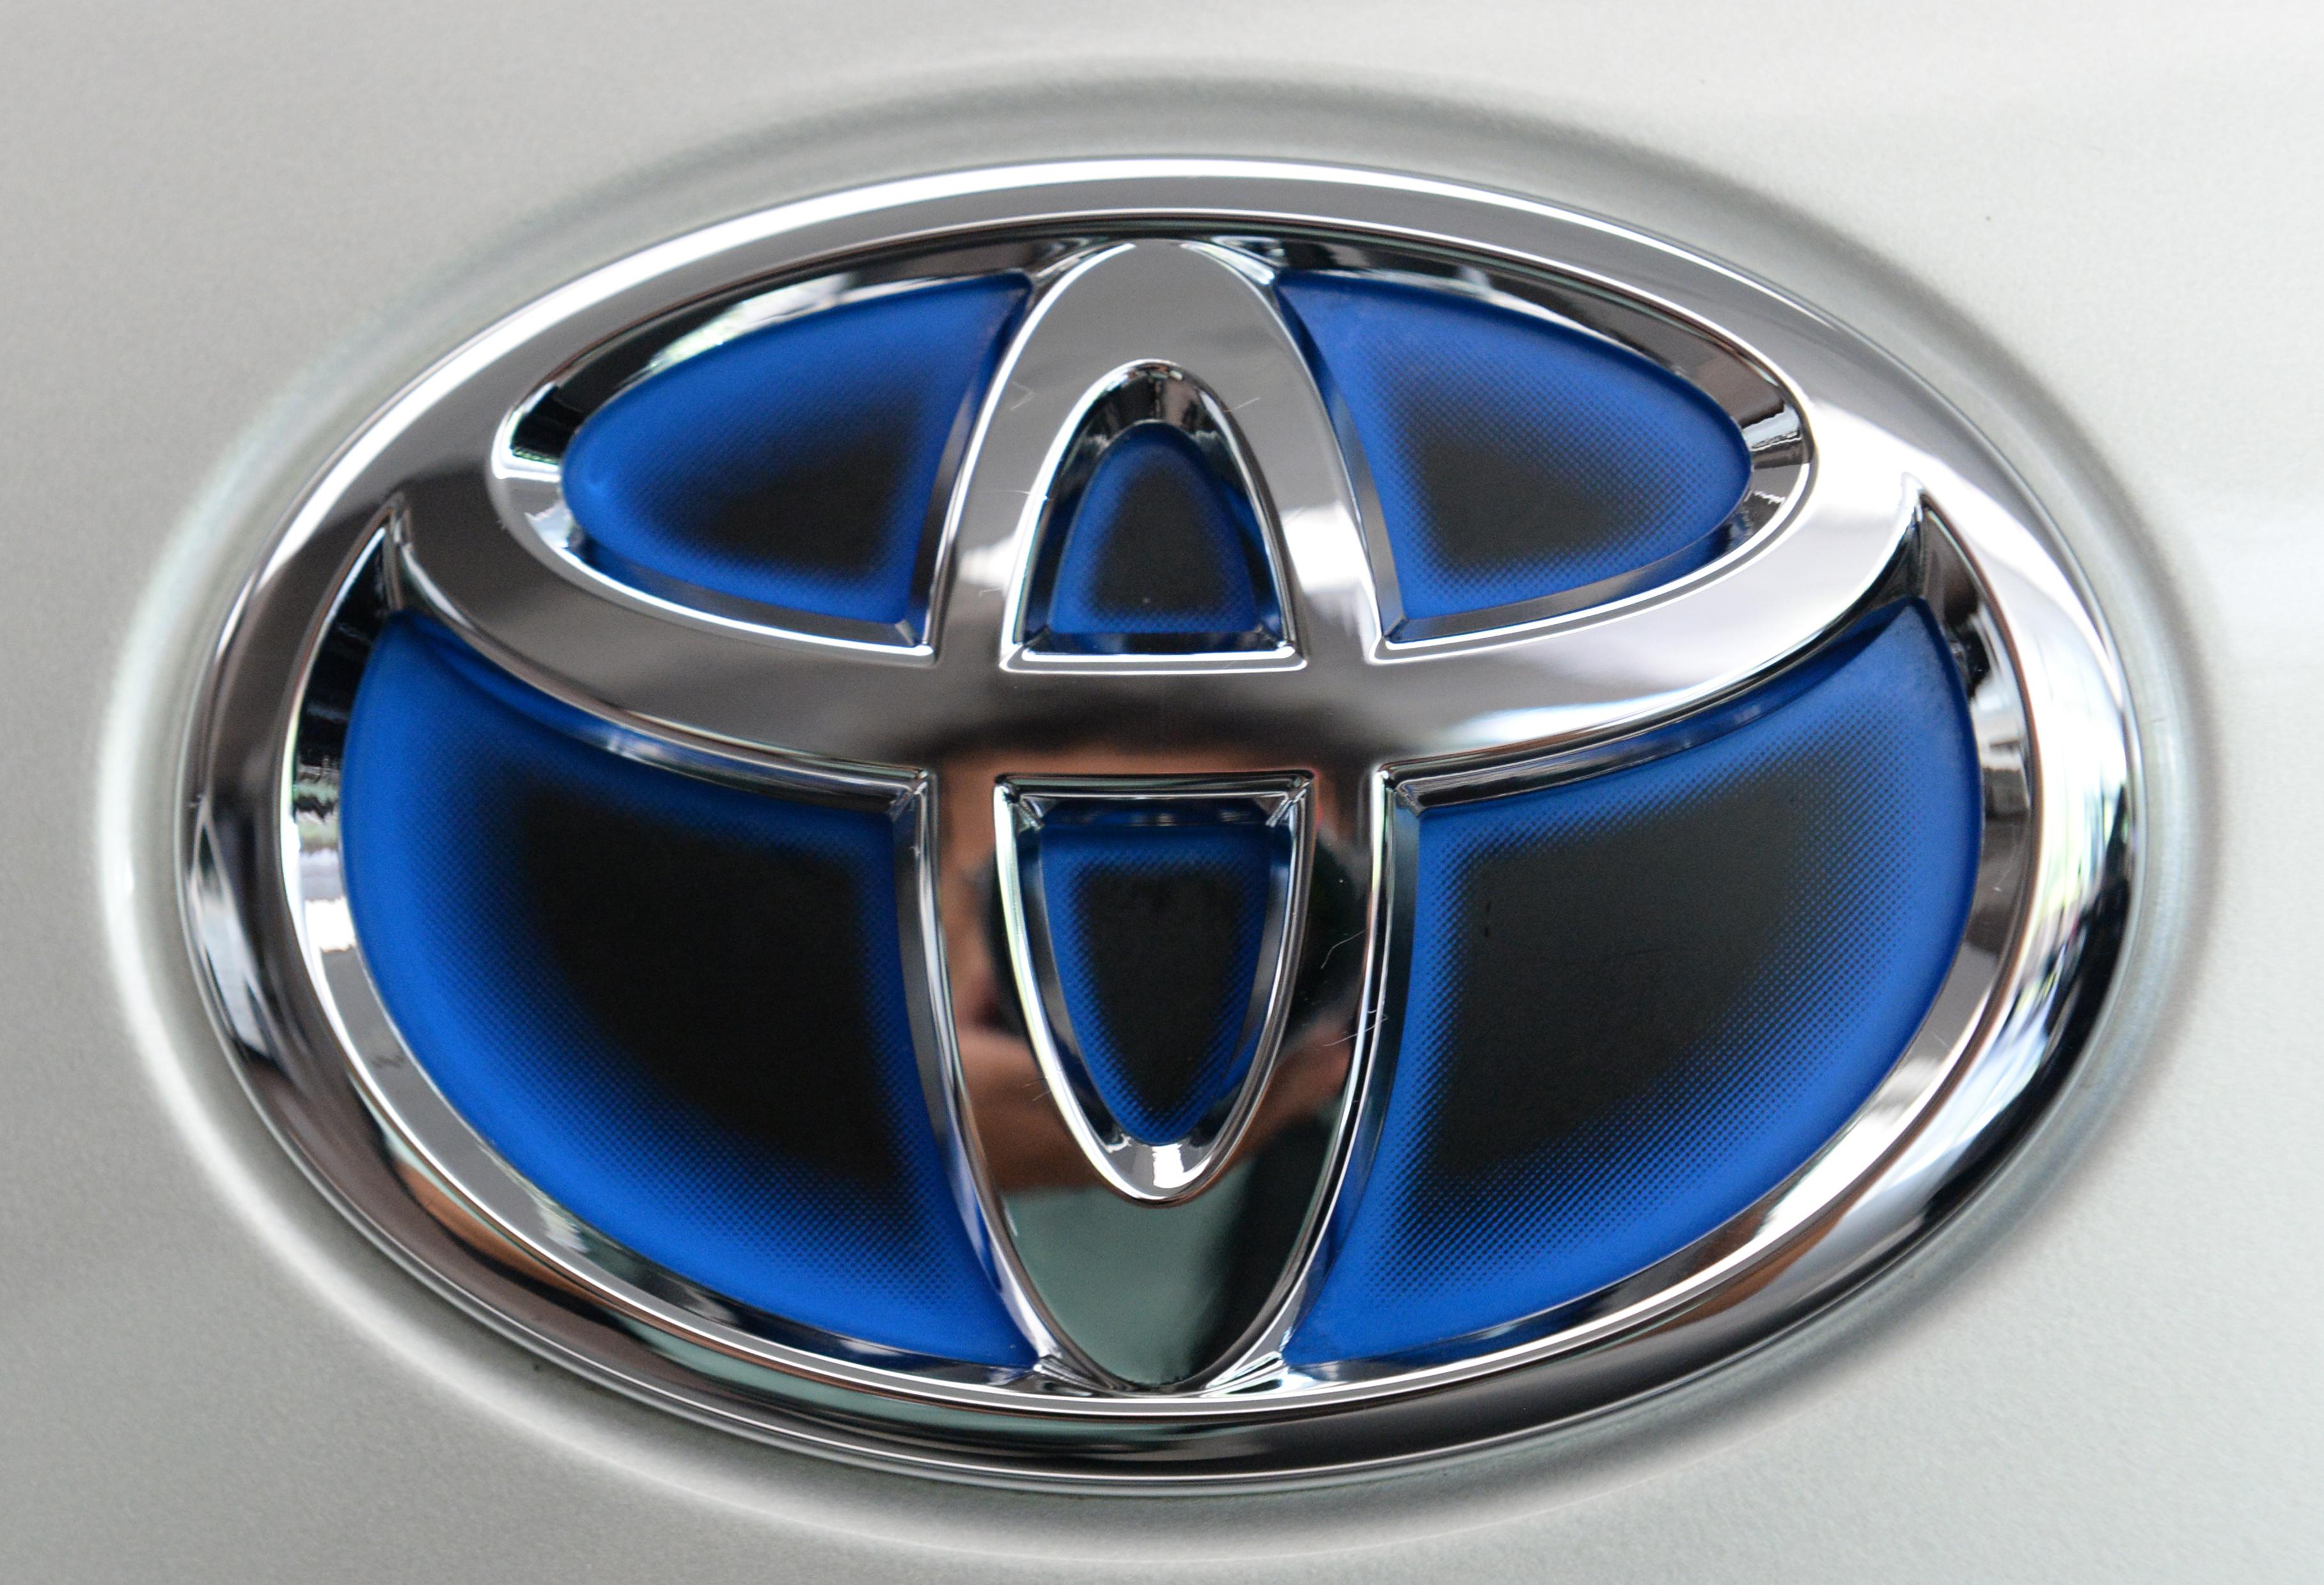 Toyota Issues Recalls On Corolla, Sequoia, Tundra, Lexus SC Models